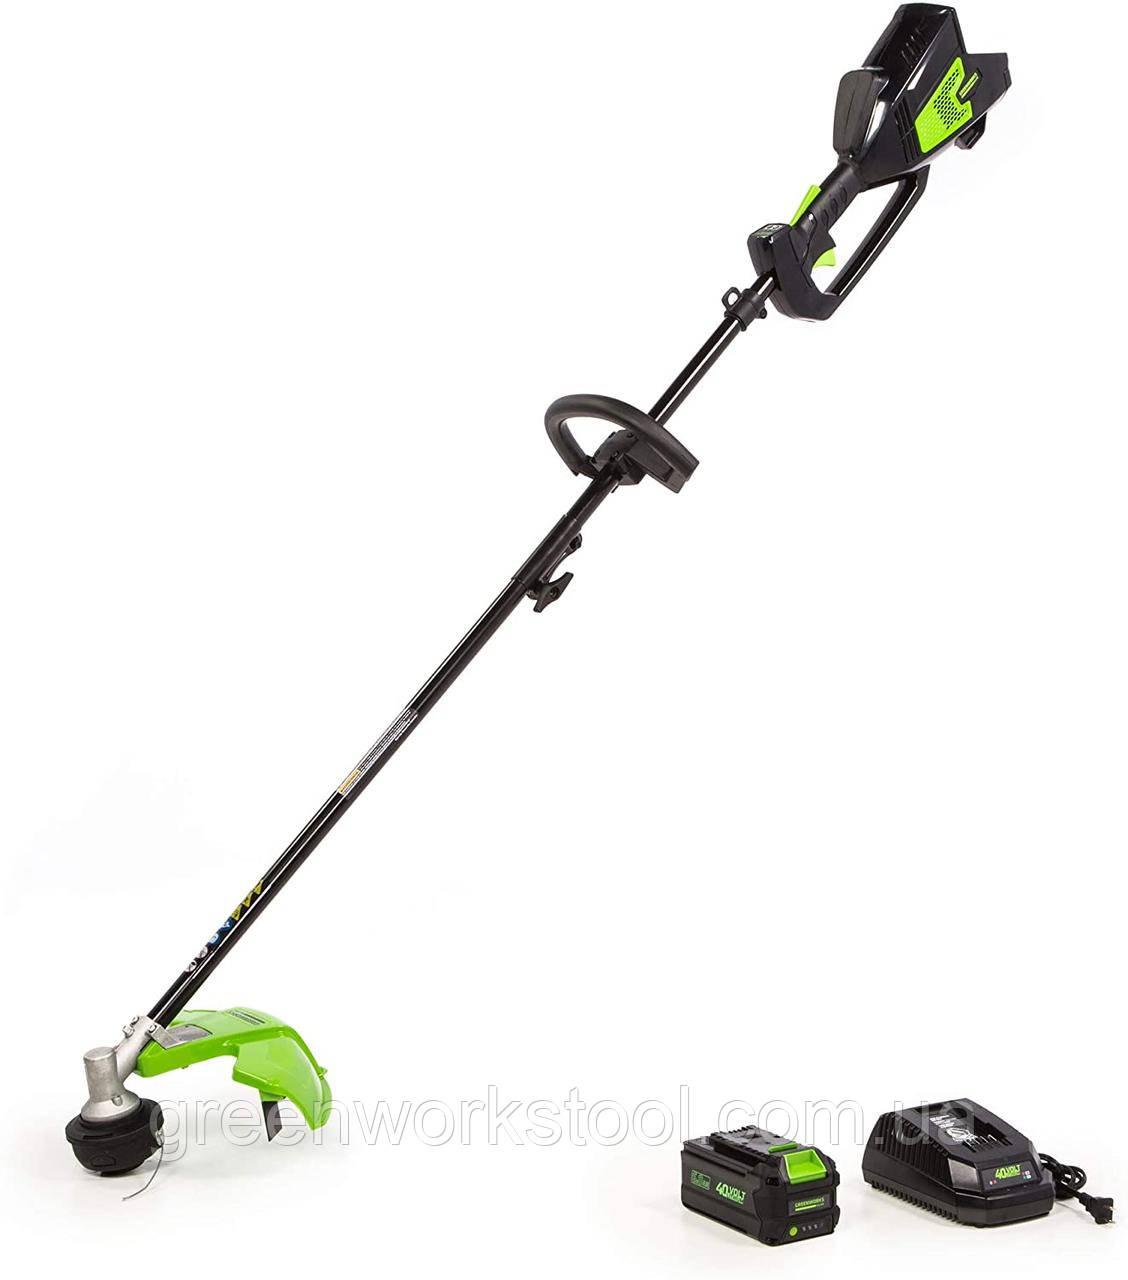 Аккумуляторный бесщеточный триммер,электрокоса, кусторез Greenworks Elite ST-140-AT  (Greenworks GD40BCK4)